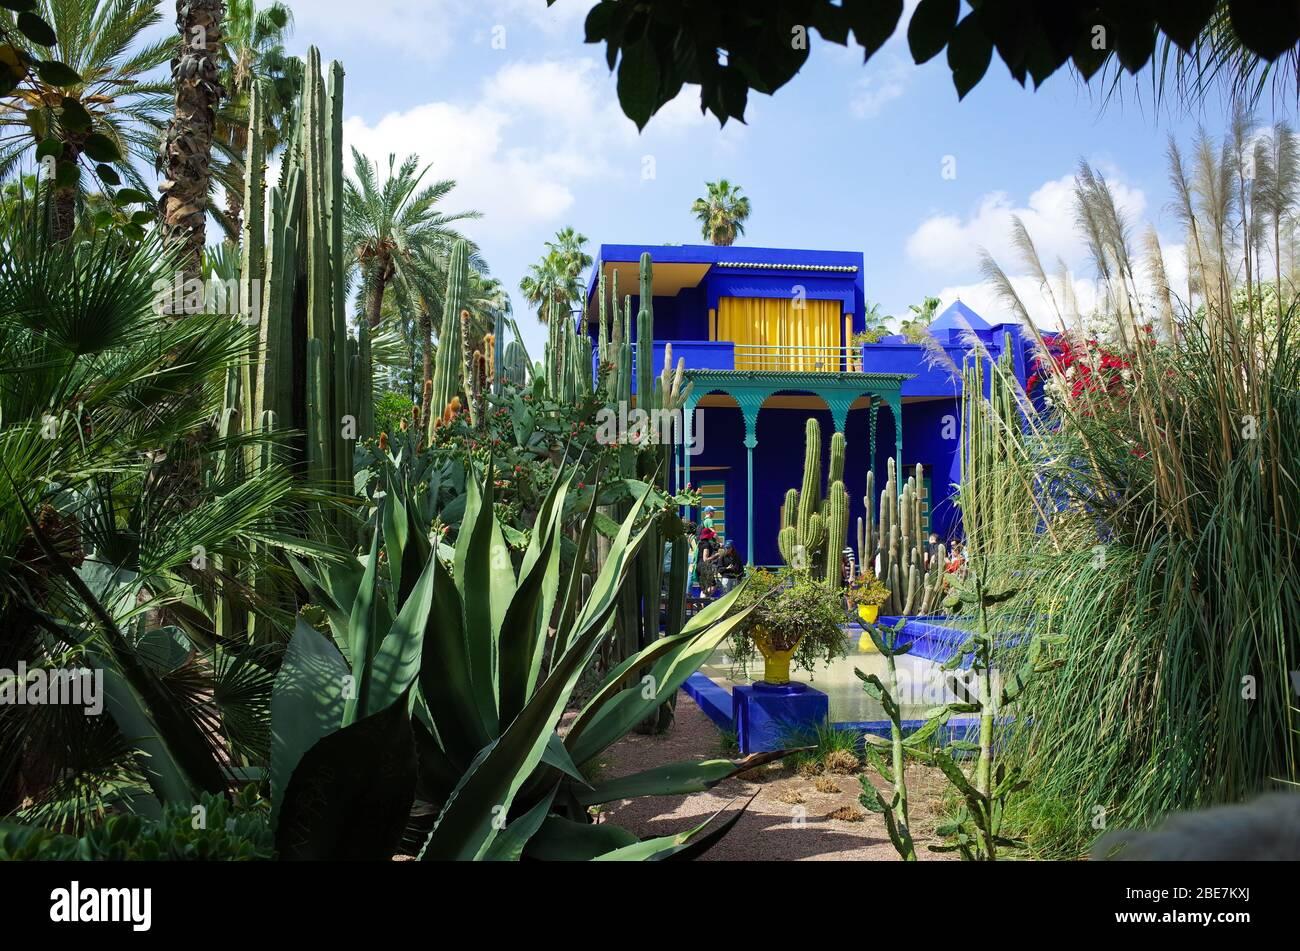 Viaje en Marruecos en el Museo YSL, Casa Azul de Yves Saint Laurent Foto de stock